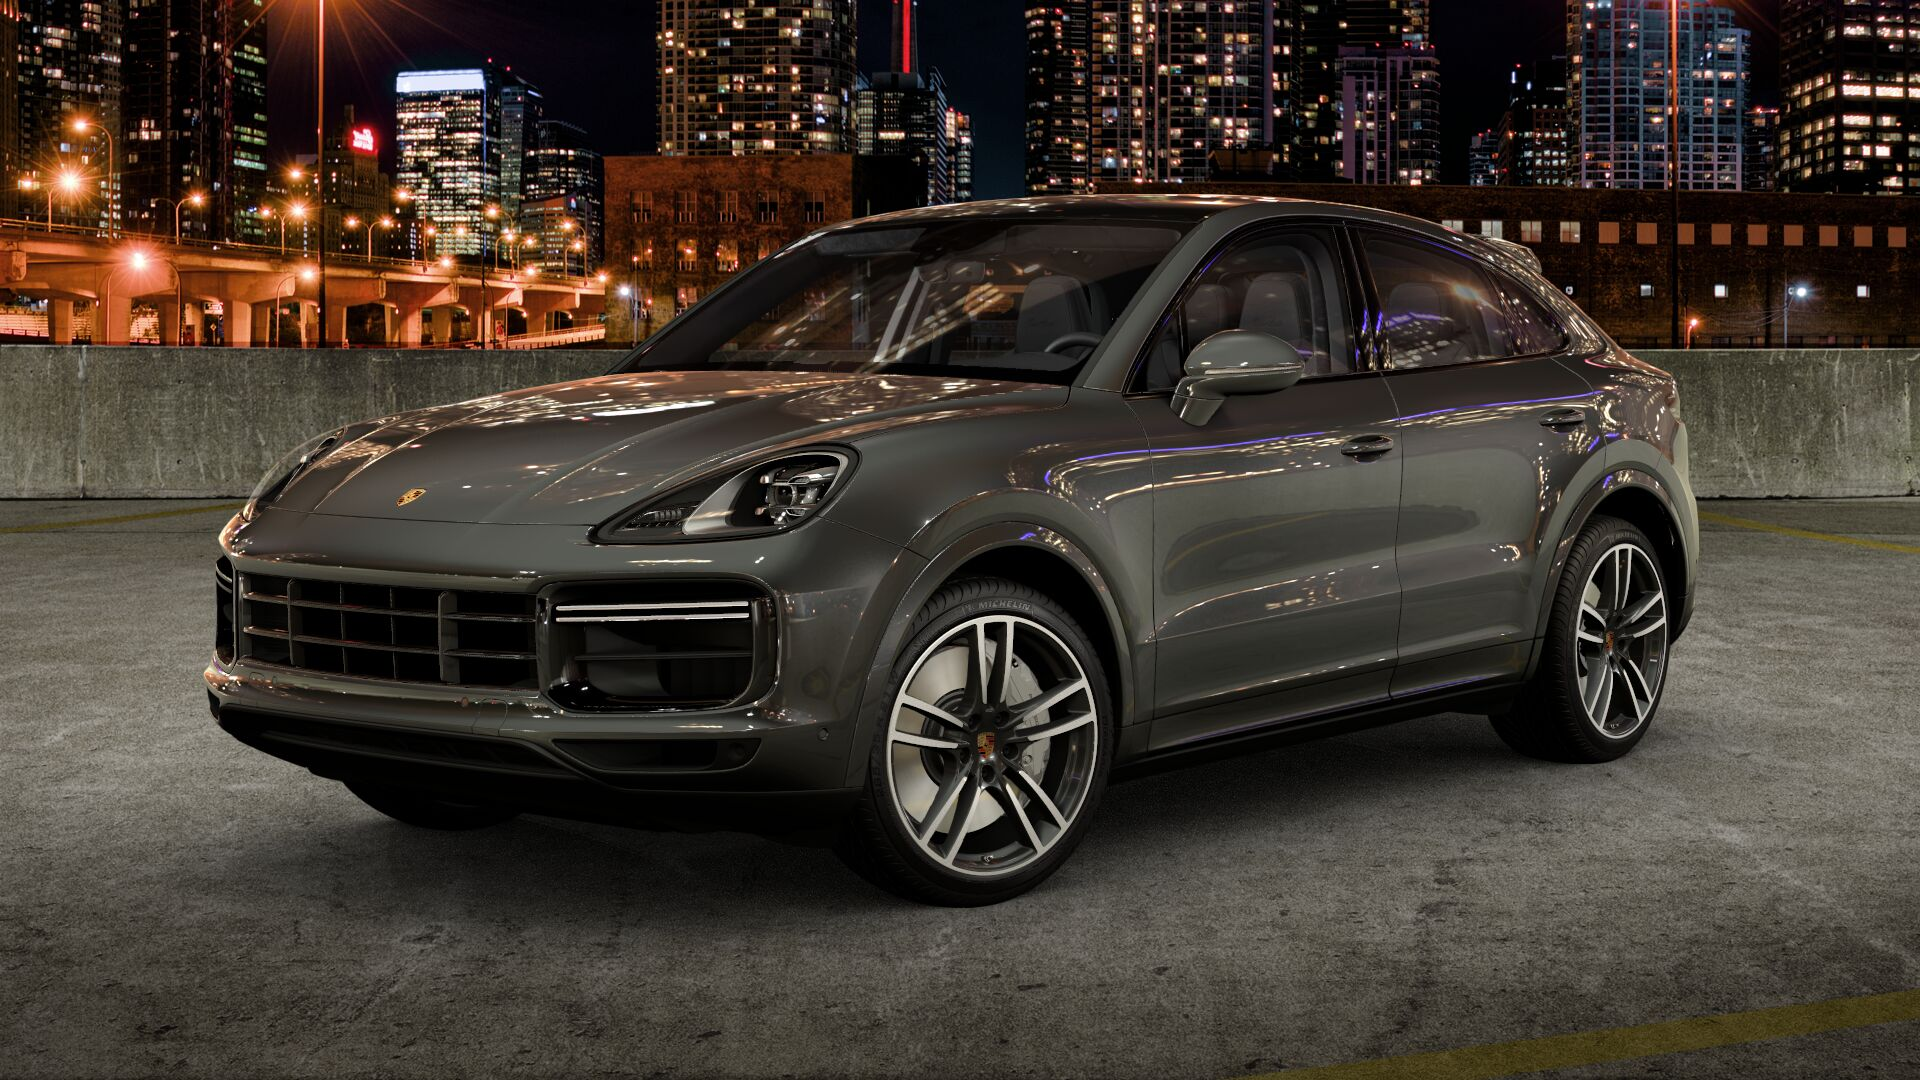 بورش Cayenne Turbo Coupé الجديدة 2020